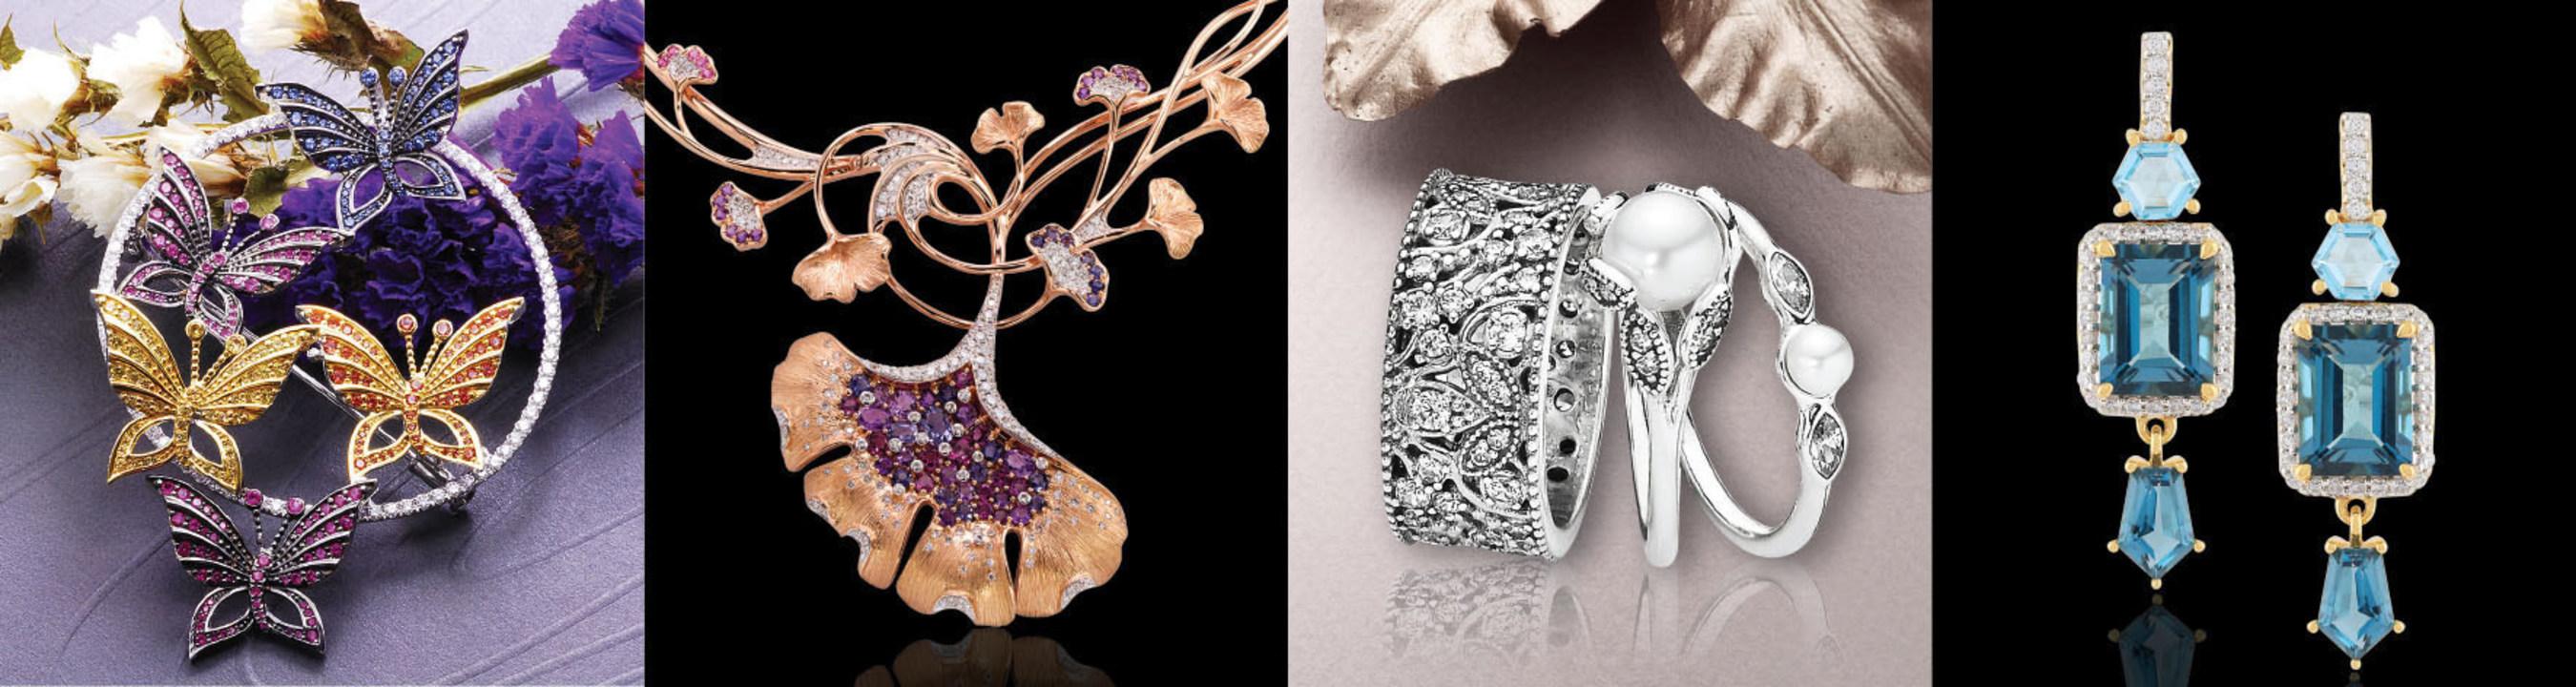 Jewellery pieces by (from left) China Stone Ltd, MKS Jewelry International Co Ltd, PANDORA Production Co Ltd, Pranda Group